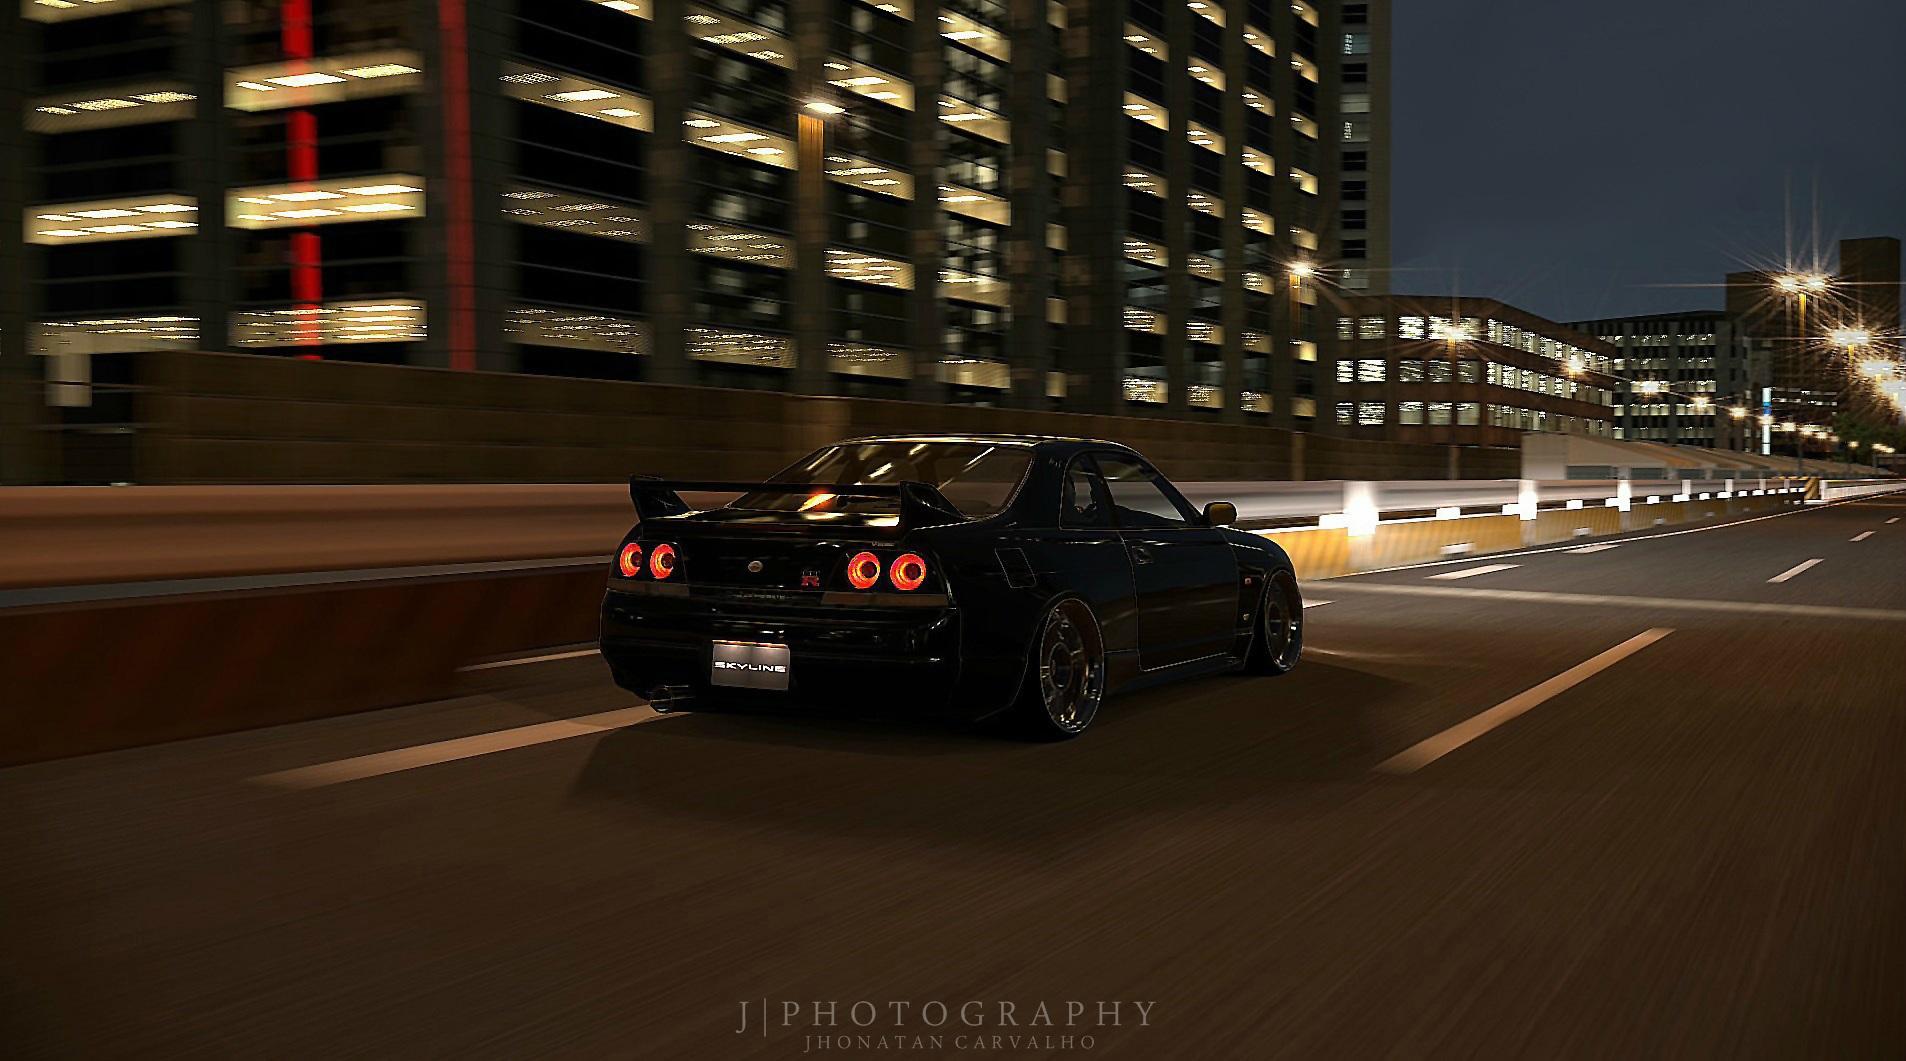 Stanced Car Wallpaper Hd Wallpaper Japan Night Skyline Nissan Sony Sports